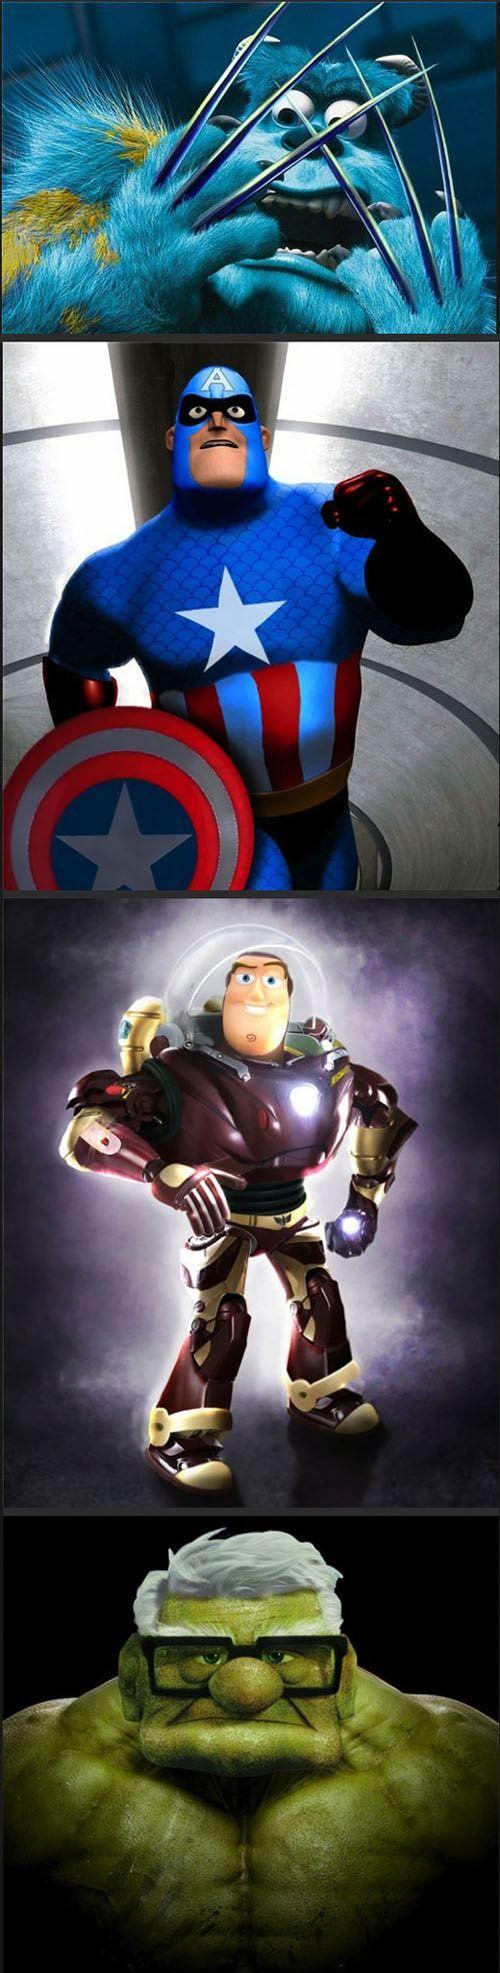 pixar avengers: Pixar Marvel, Disney Marvel, Iron Man, Disney Pixar, Super Heroes, Disney Avengers, Disney Character, The Avengers, Superhero